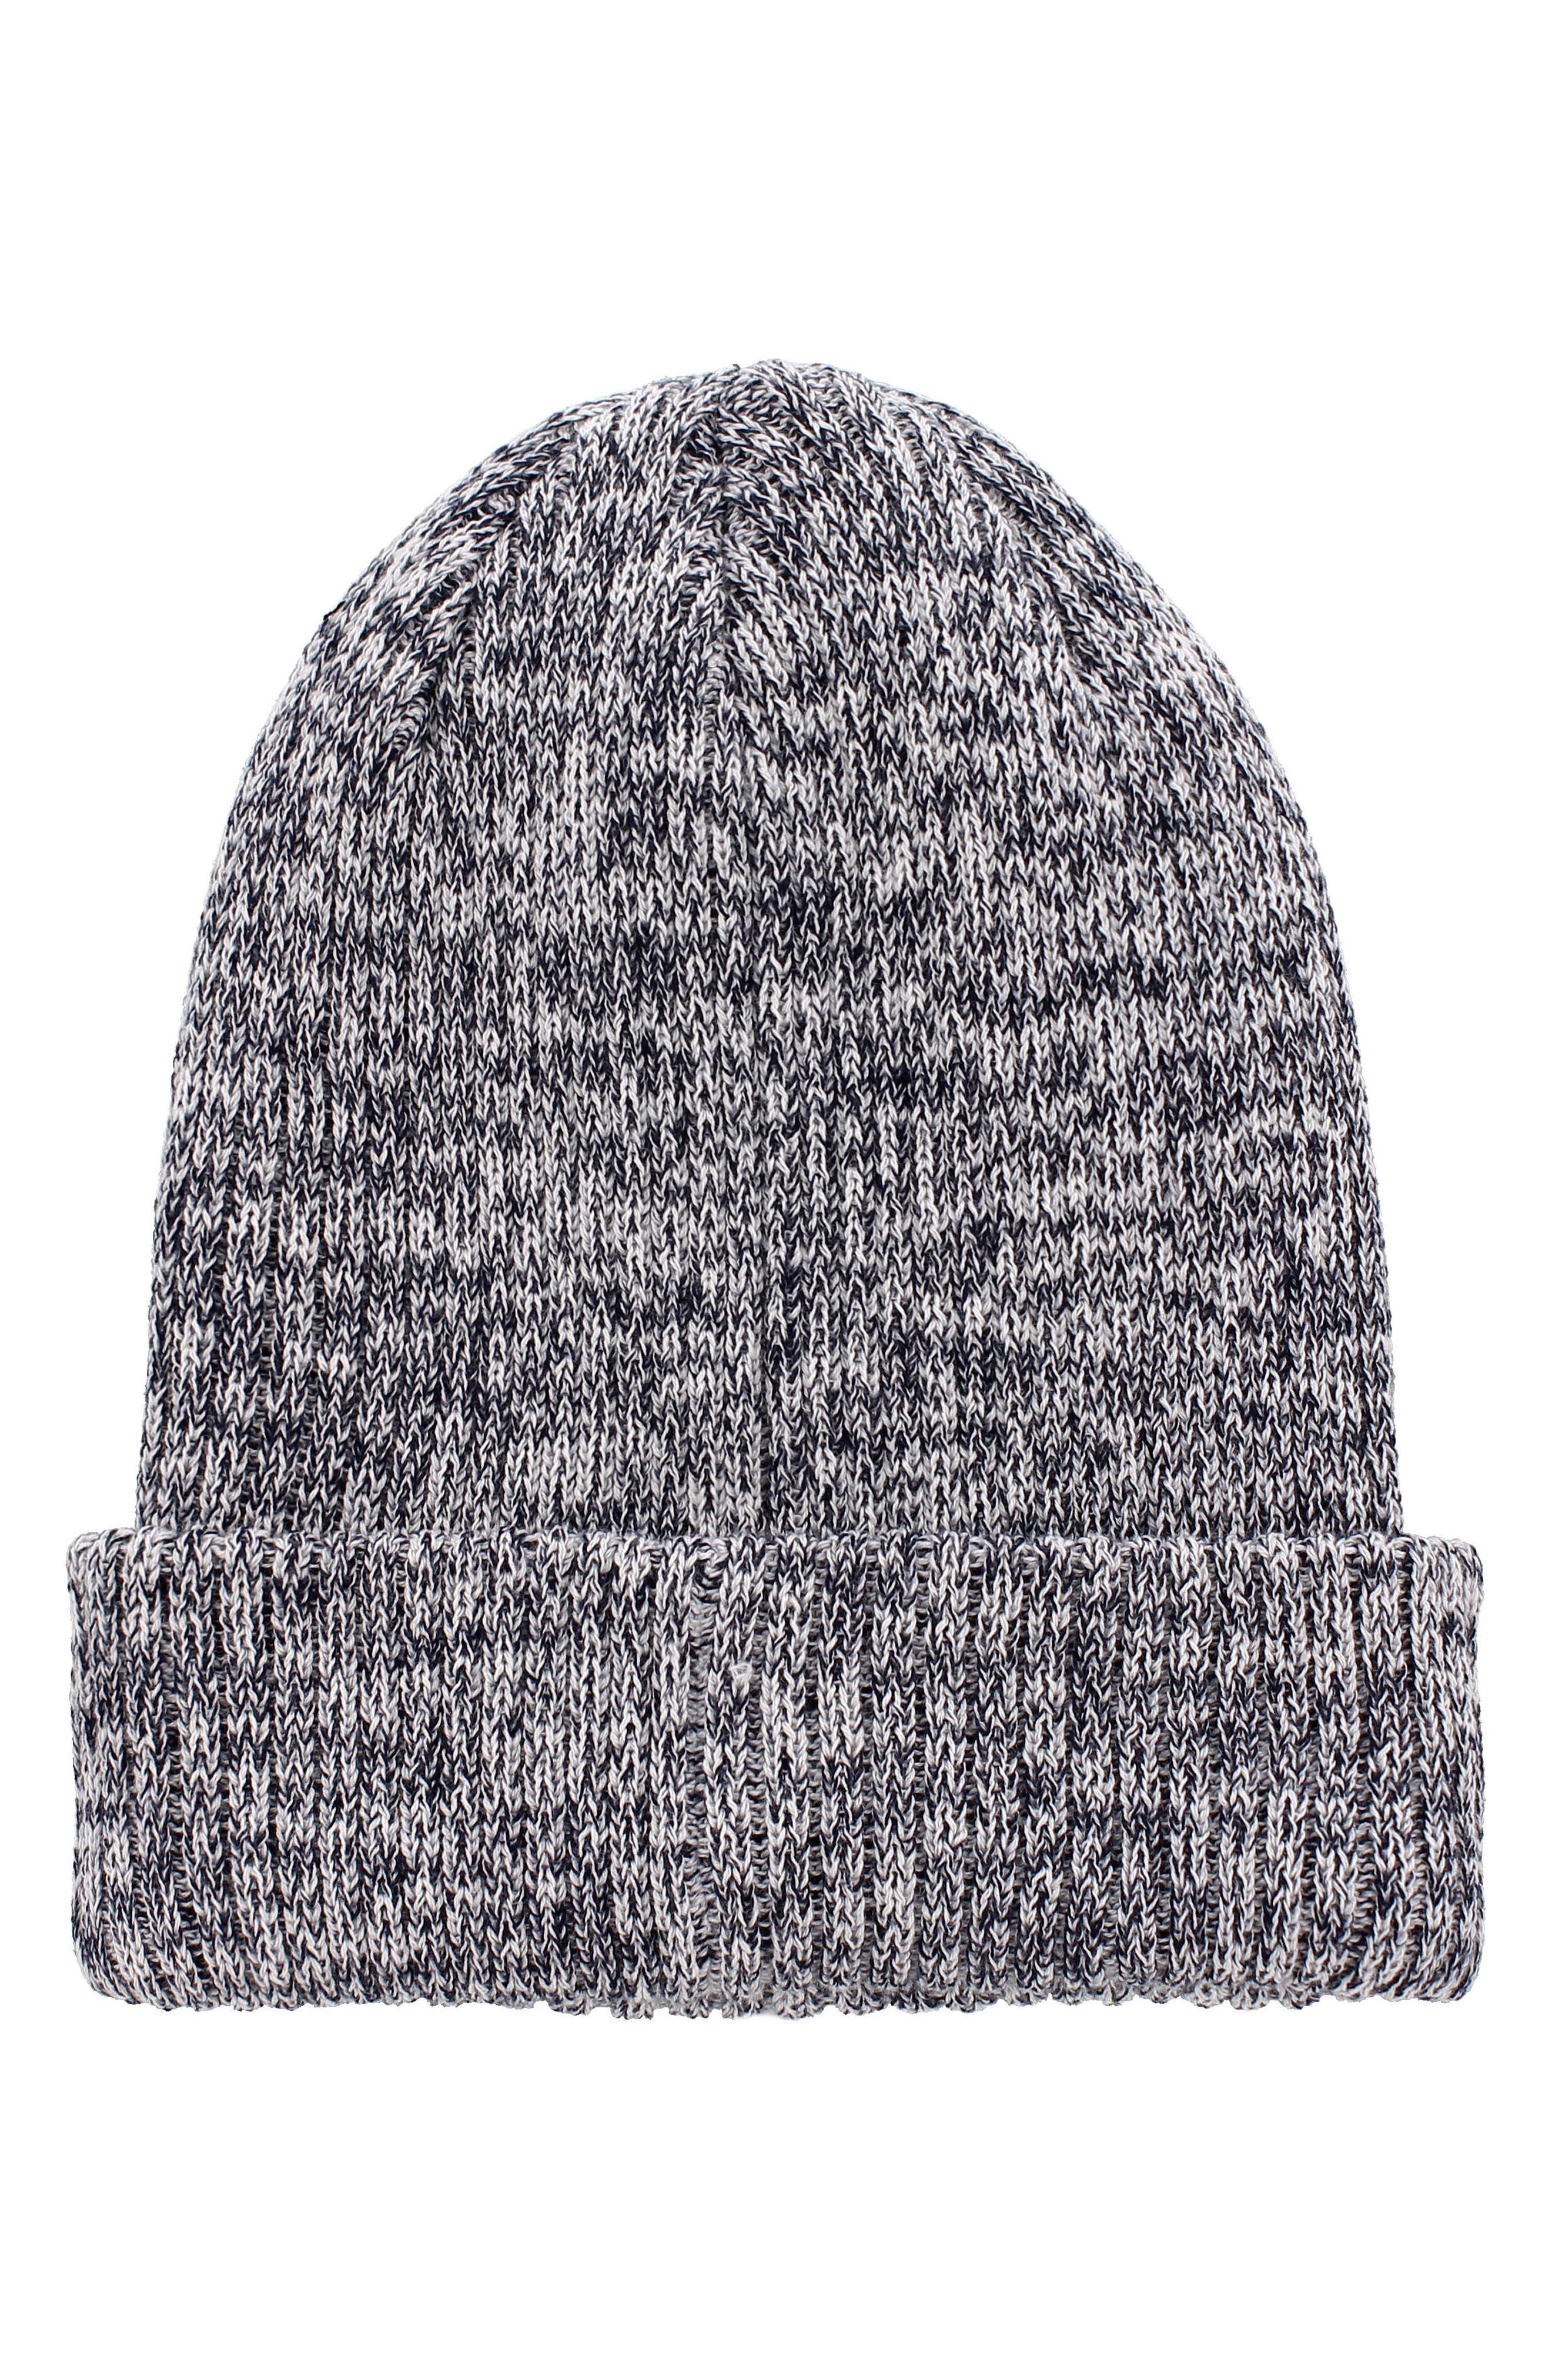 Alternate Image 2  - adidas Originals NMD Knit Cap